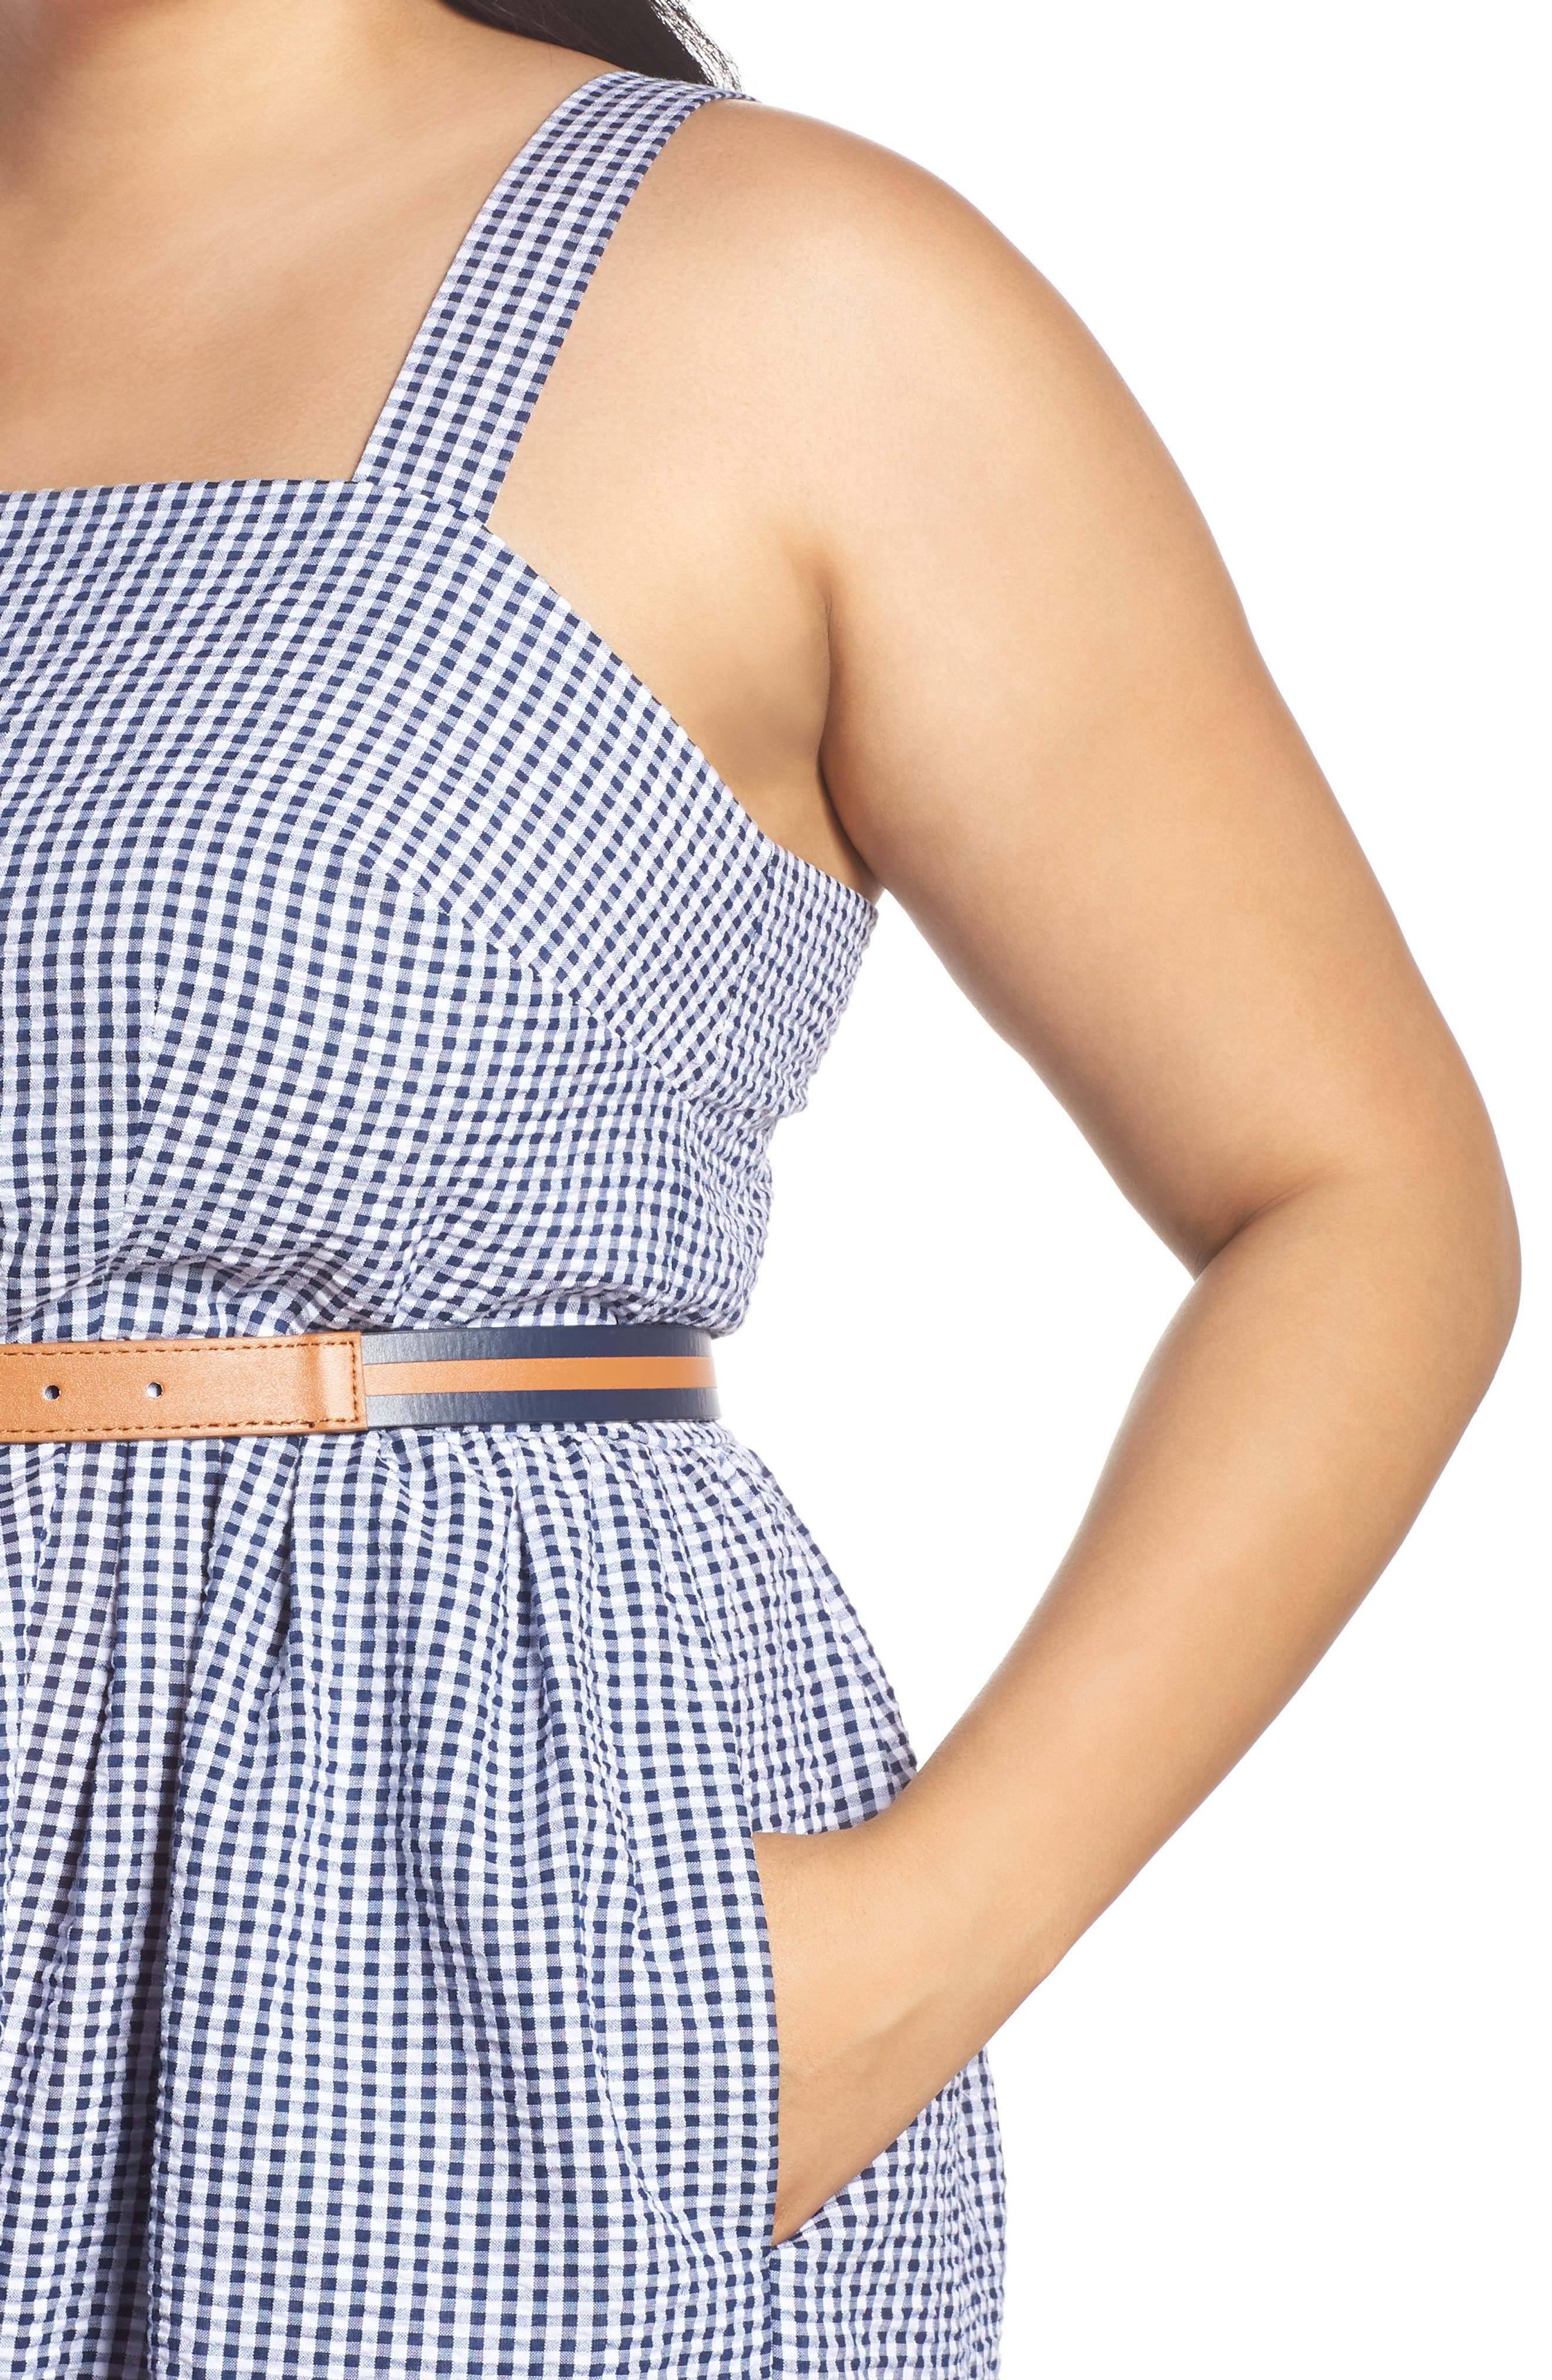 Belted Gingham Seersucker Fit & Flare Dress,                             Alternate thumbnail 4, color,                             410